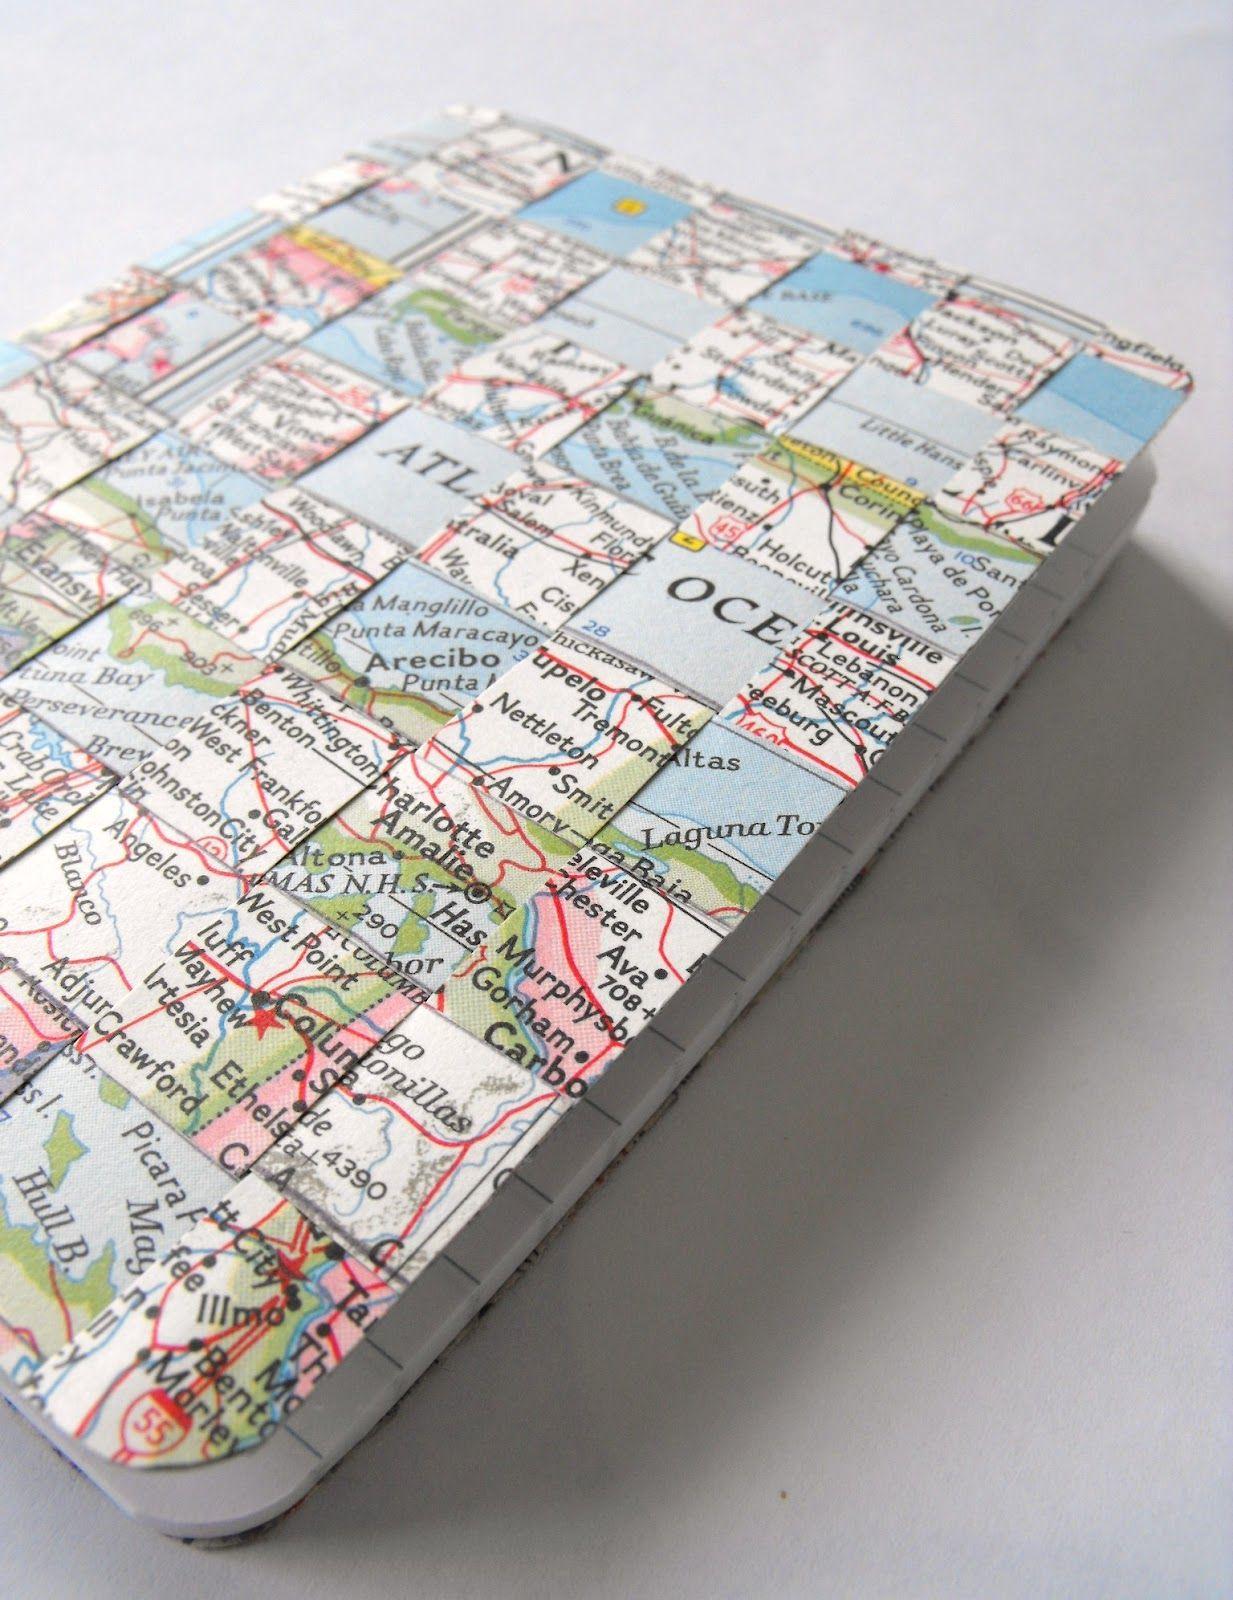 10 creative diy book cover ideas - Dollar Store Crafts Blog Archive Make A Woven Map Notebook Notebook Coversnotebook Diyart